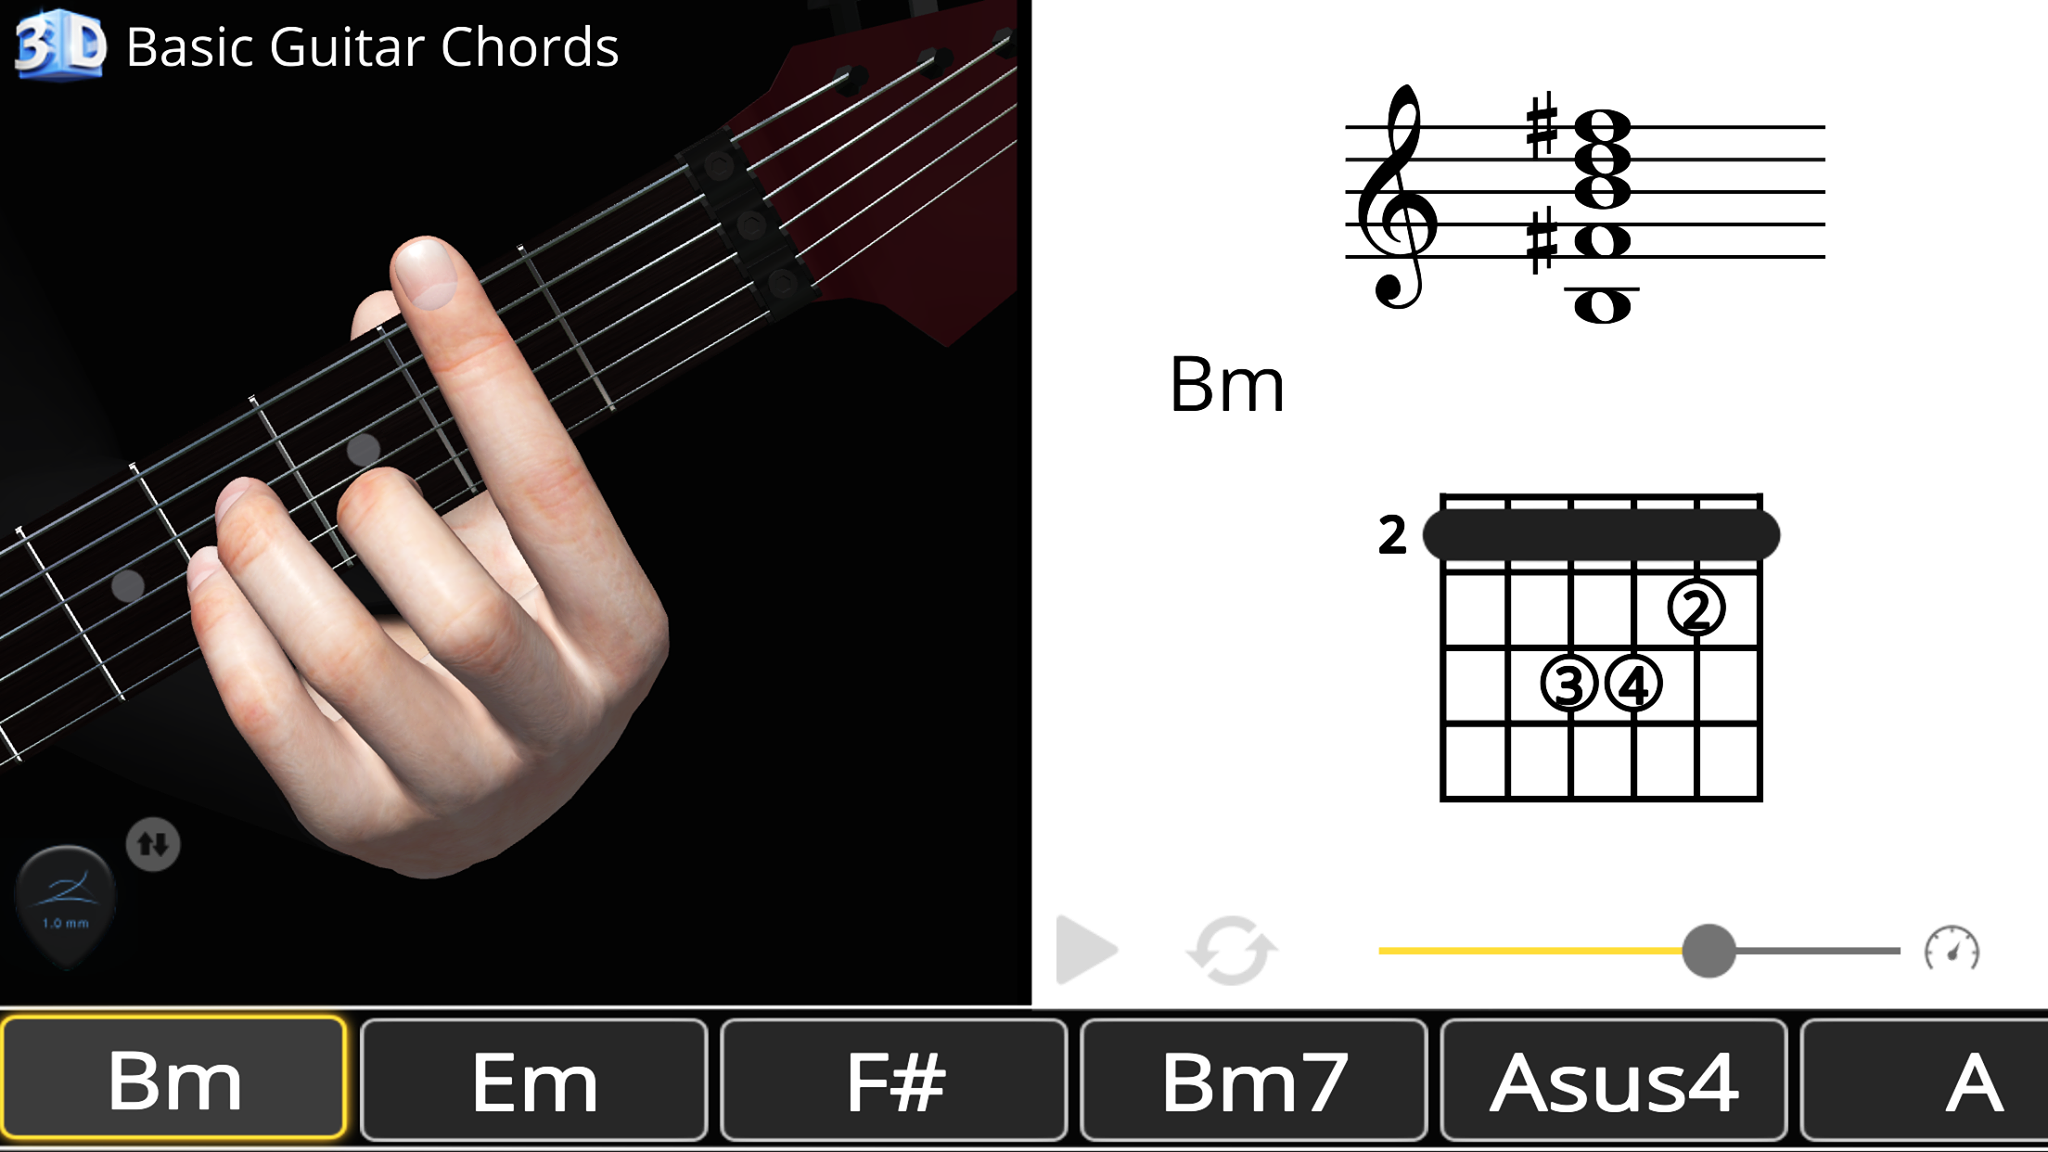 Basic Guitar Chords 3D Barre Chords